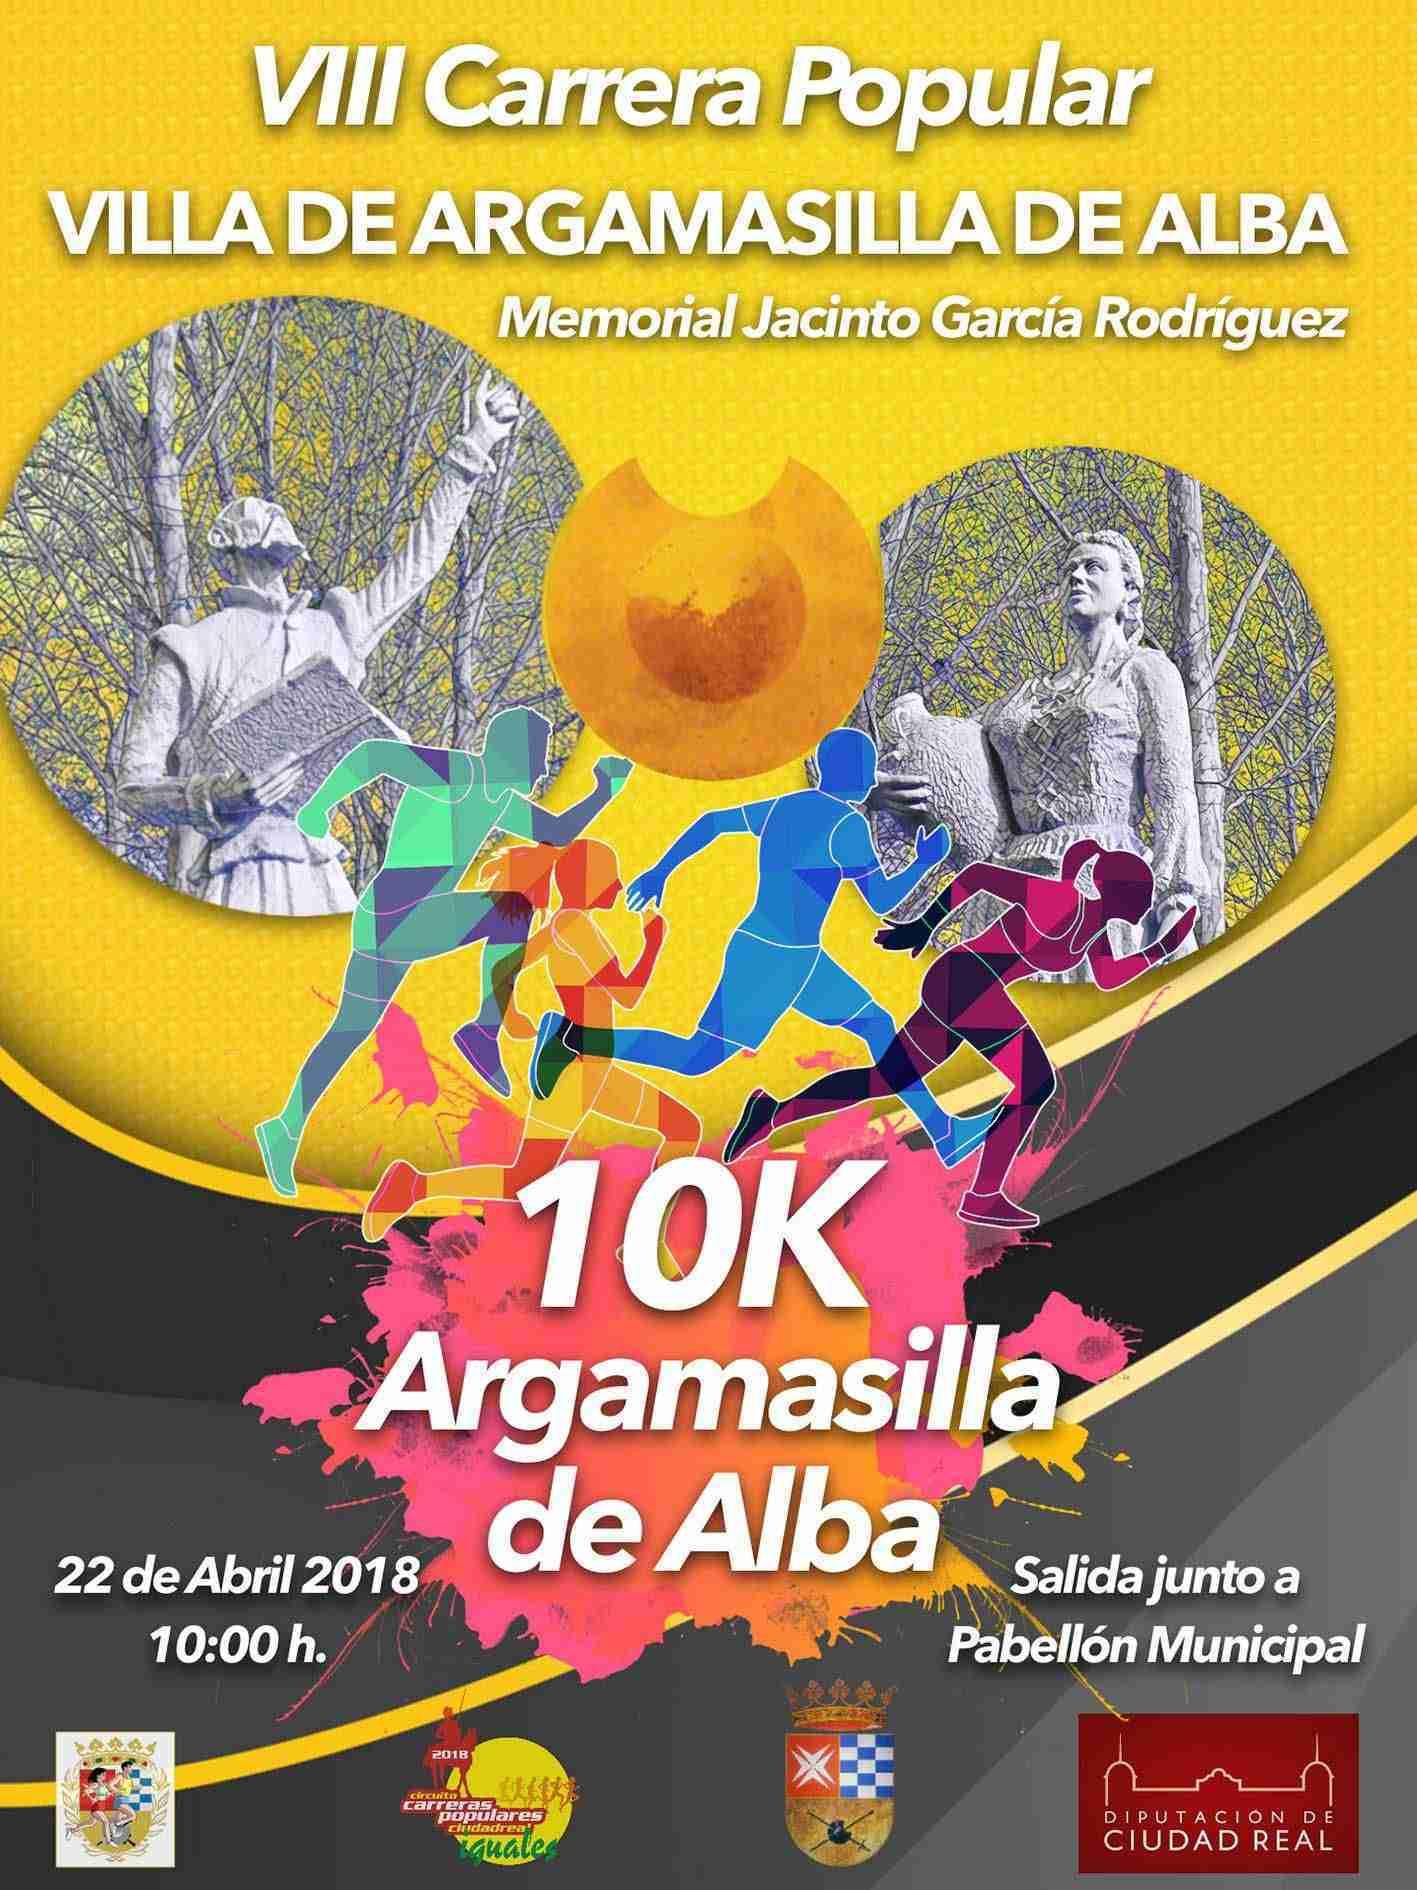 José Alfonso Herrera gana el concurso de carteles de la VIII Carrera Popular Villa de Argamasilla de Alba 3